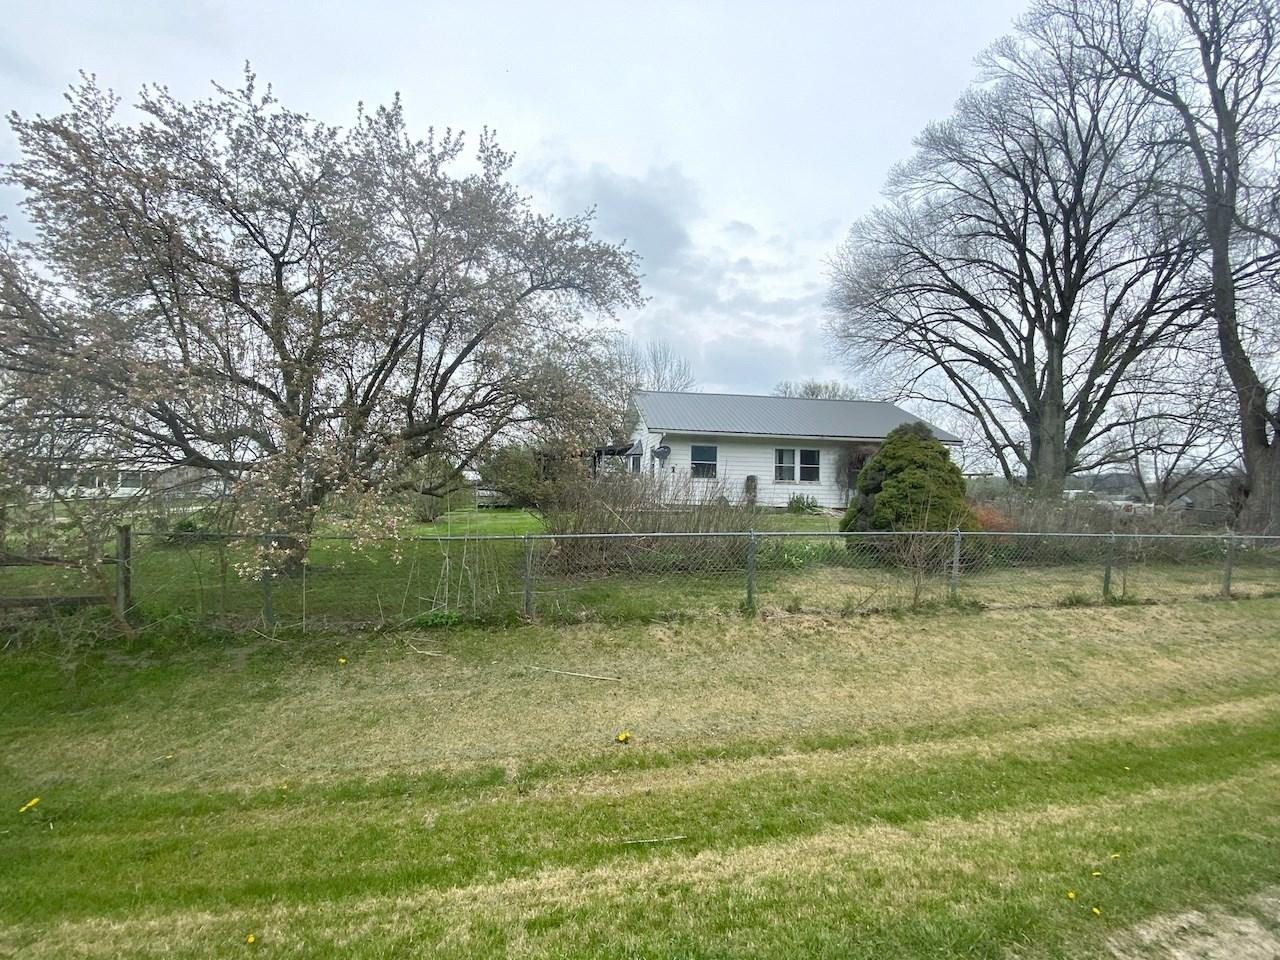 Acreage For Sale in Southern Iowa Decatur County Iowa